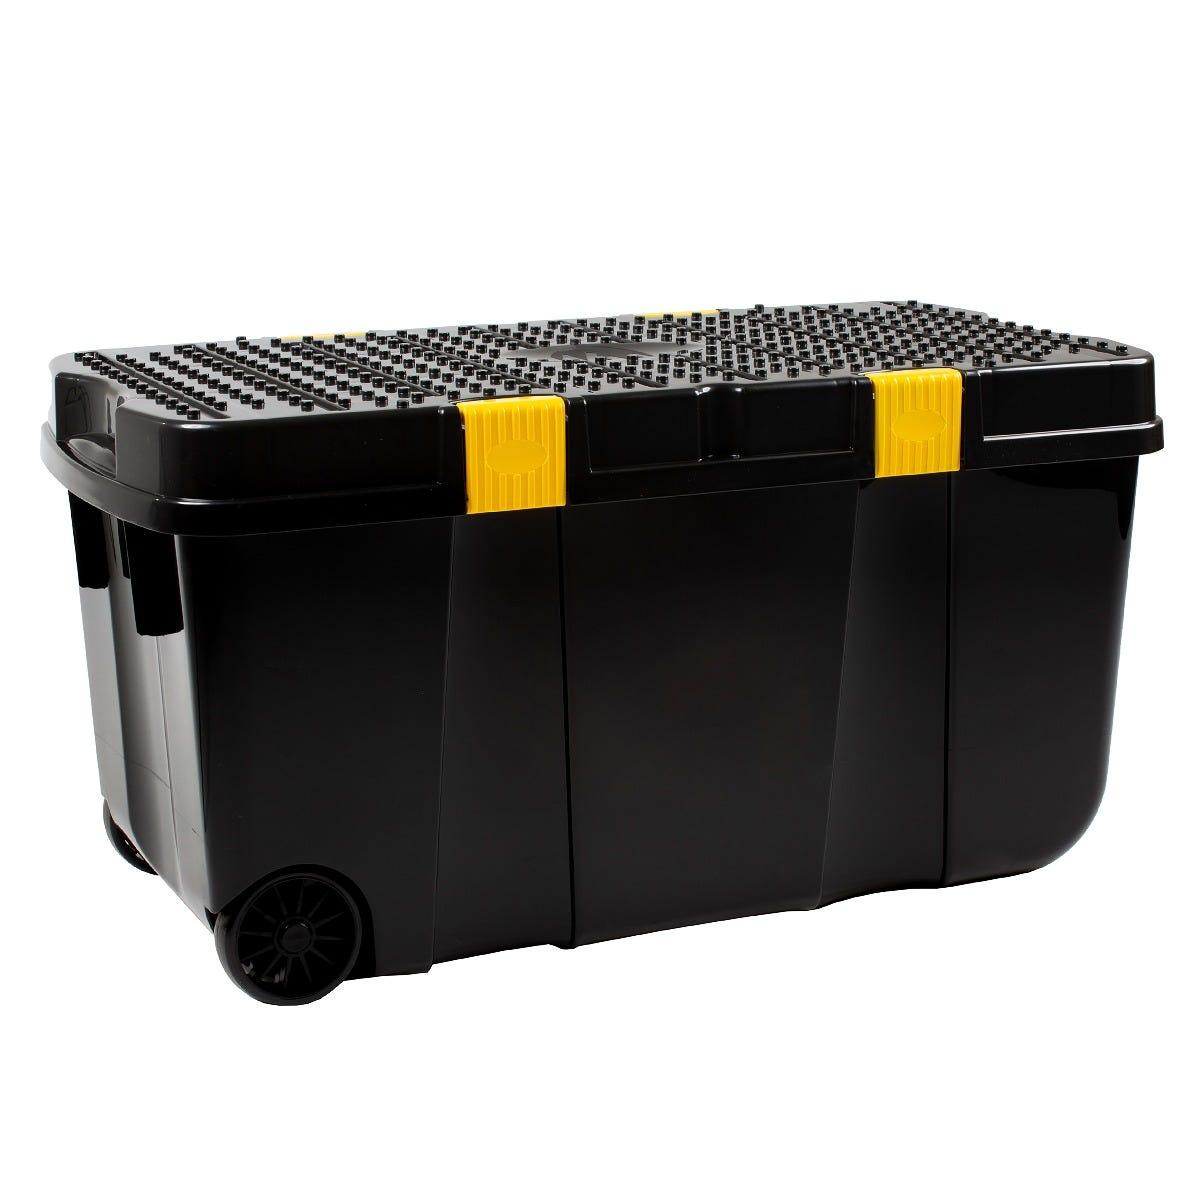 Wham DIY Tough Cart Storage Box 100L - Black and Yellow